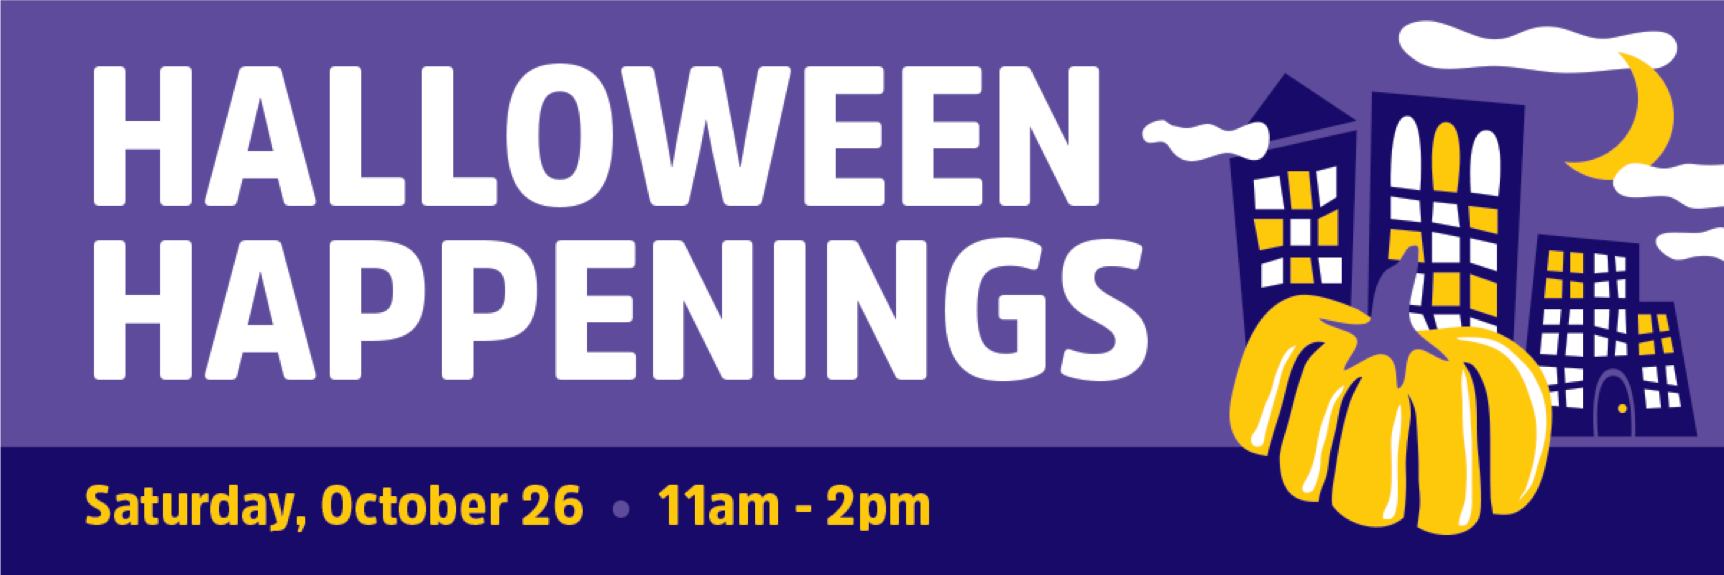 halloween-happenings-fundraiser